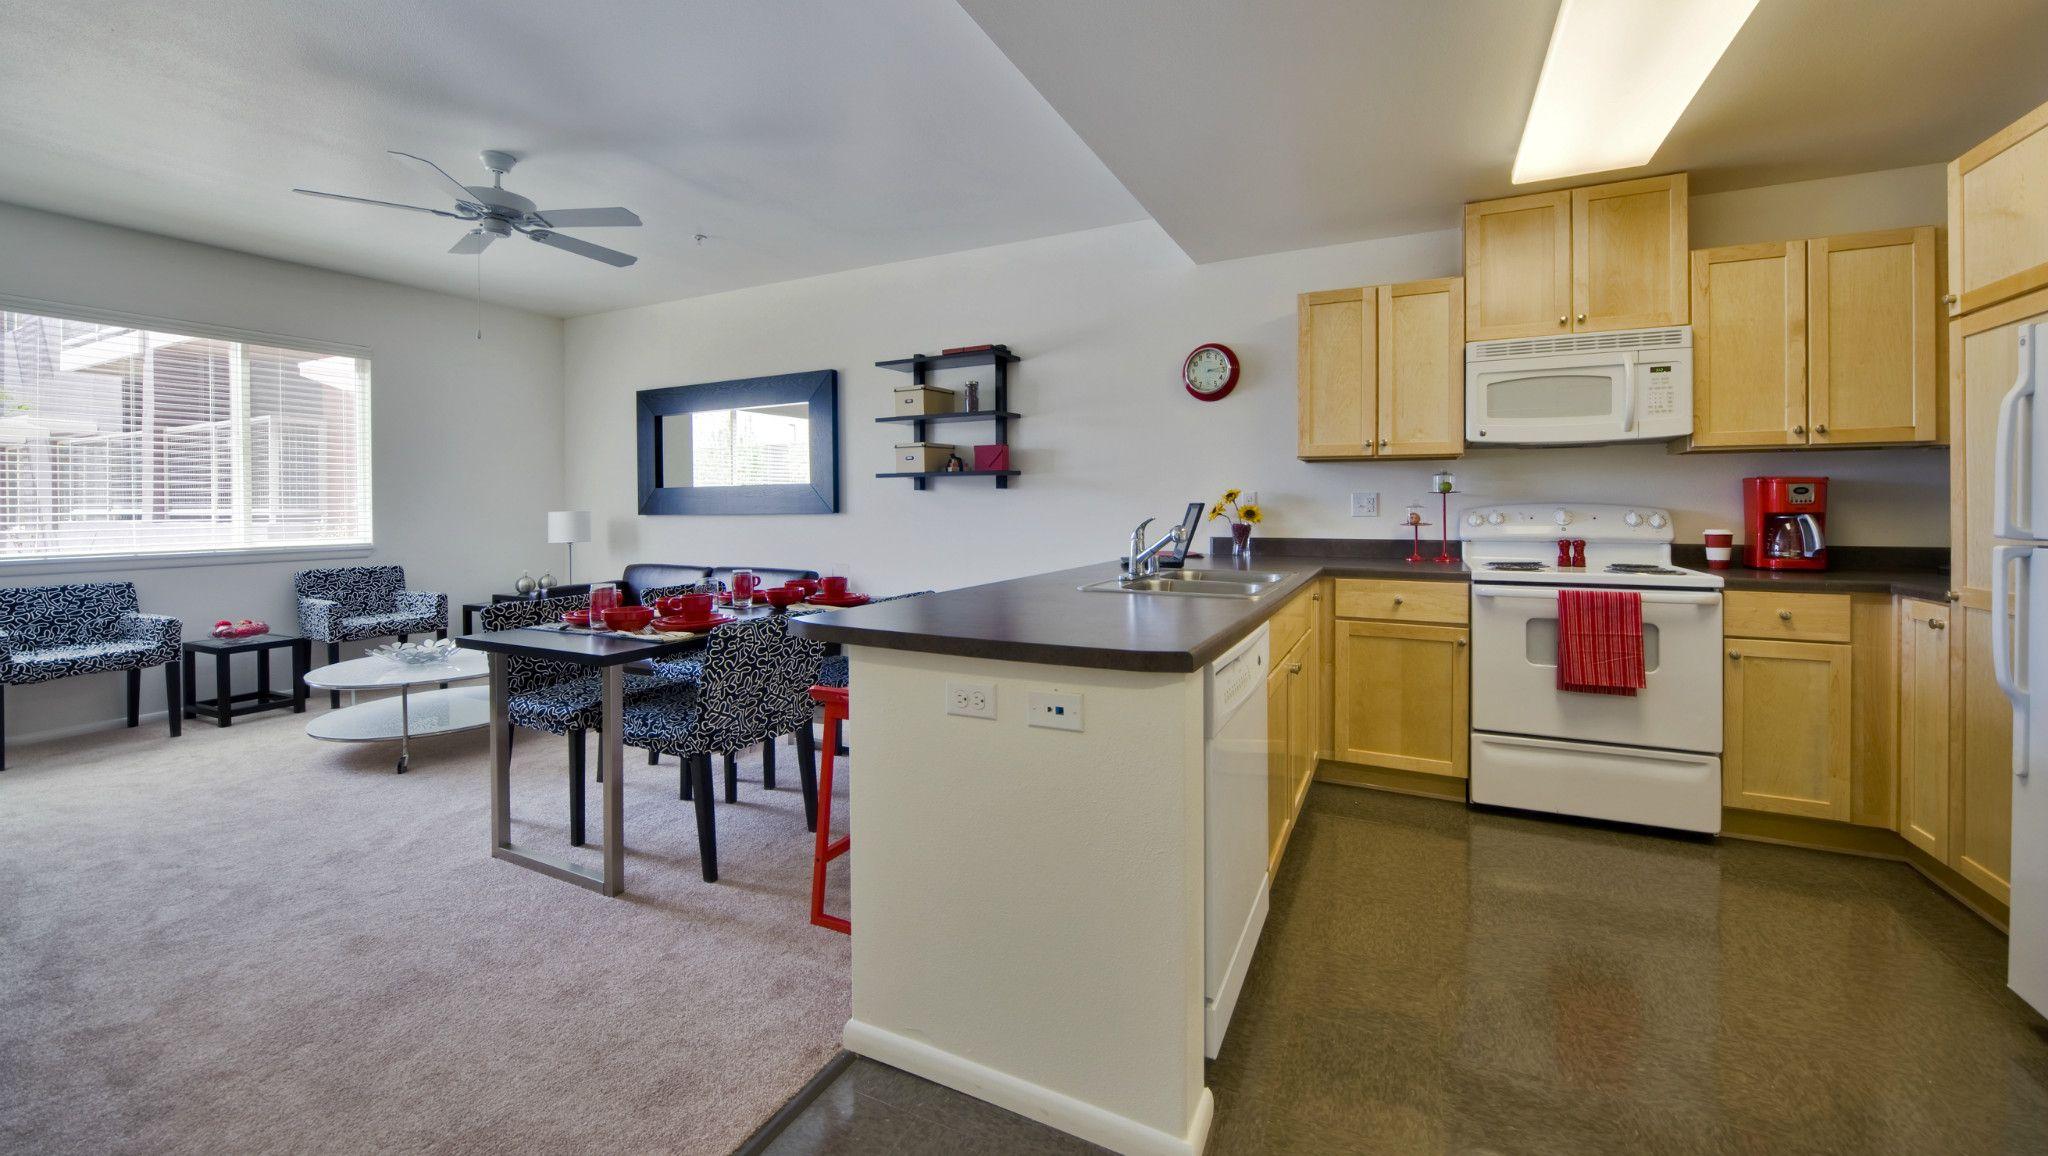 Silver Gardens Apartments Albuquerque Nm Apartment Garden Affordable Housing Housing Options